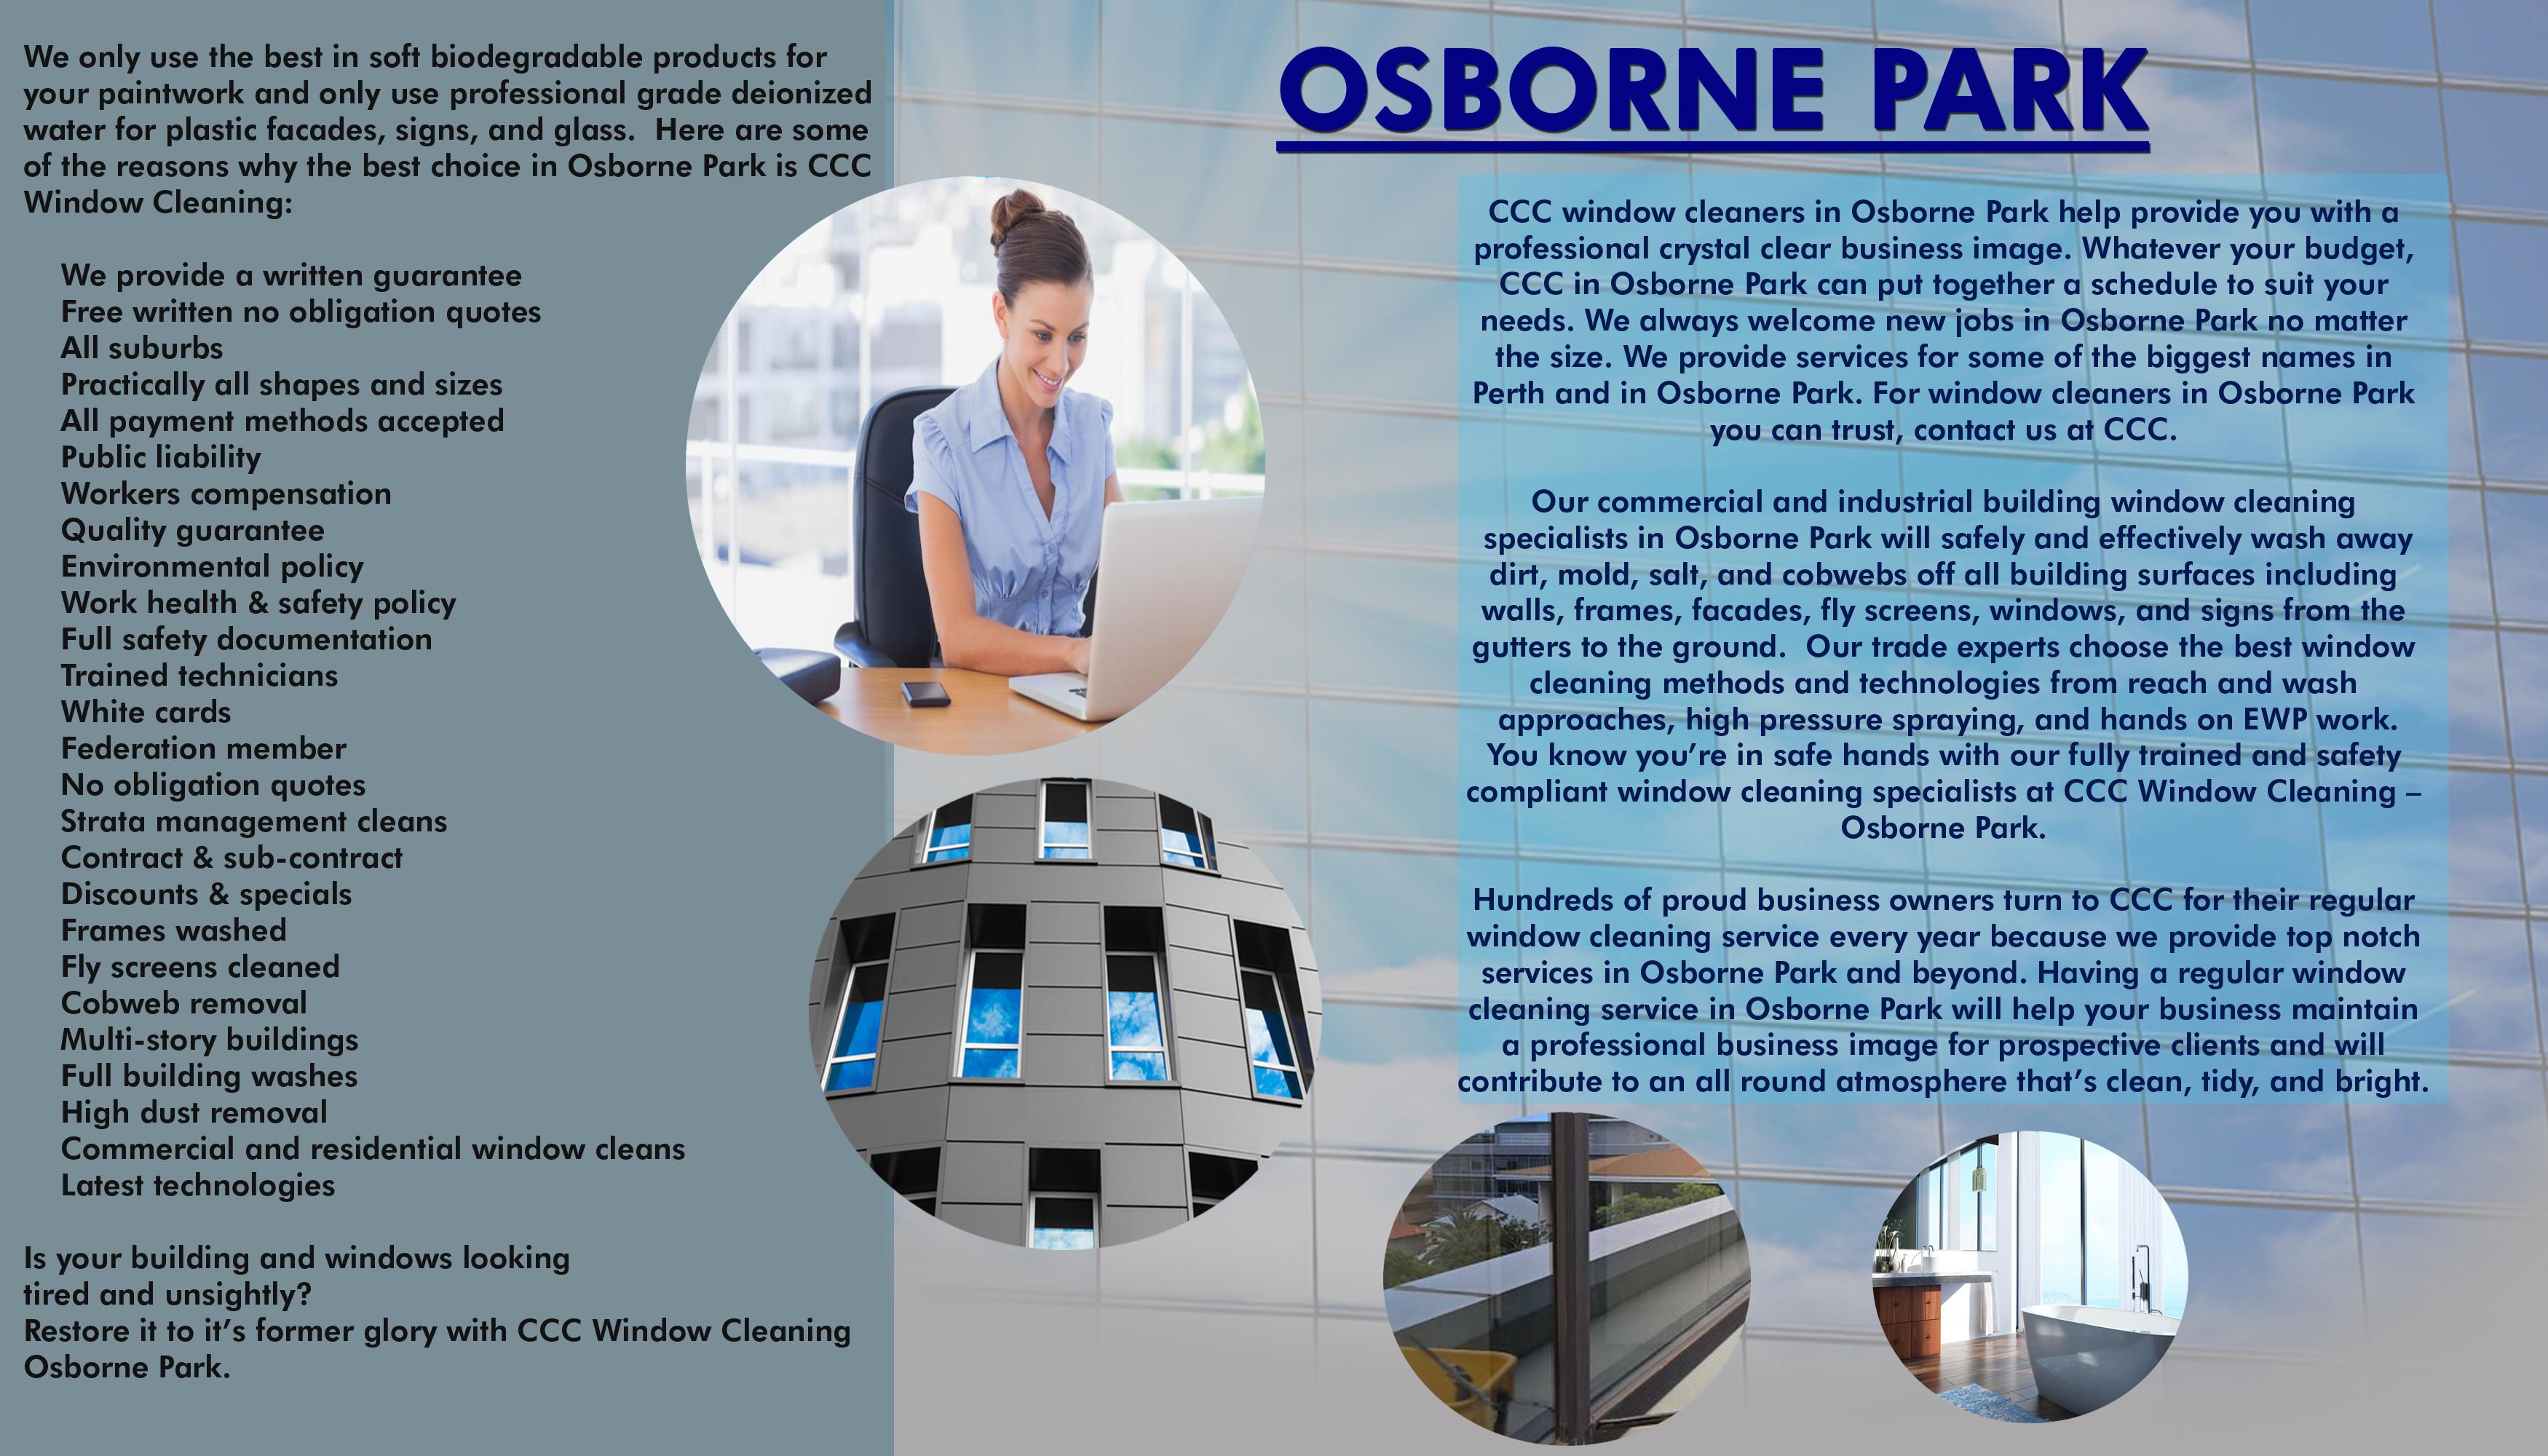 Osborne Park Infographic